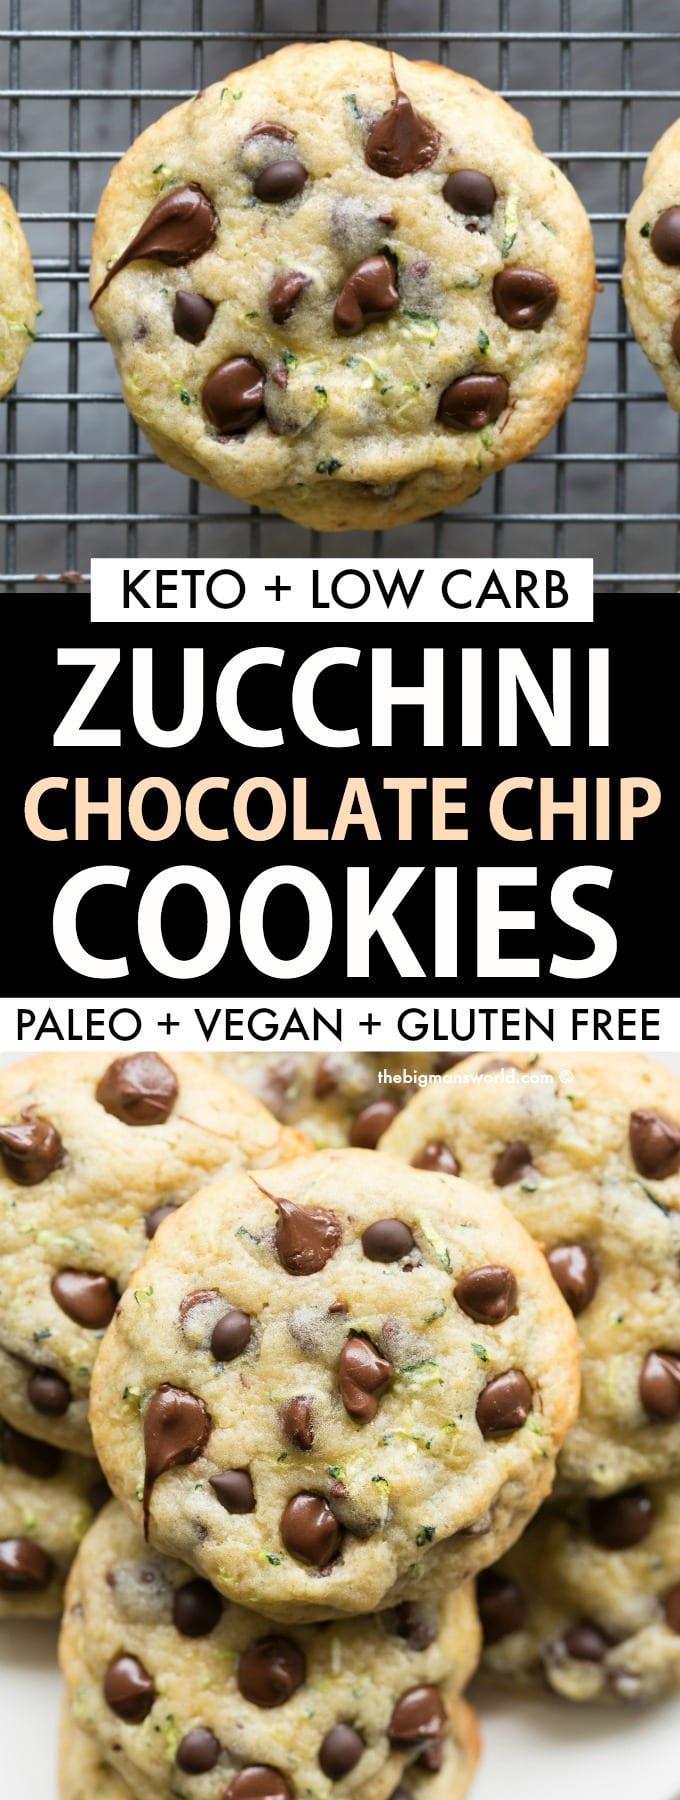 Chocolate Chip Zucchini Cookies Recipe